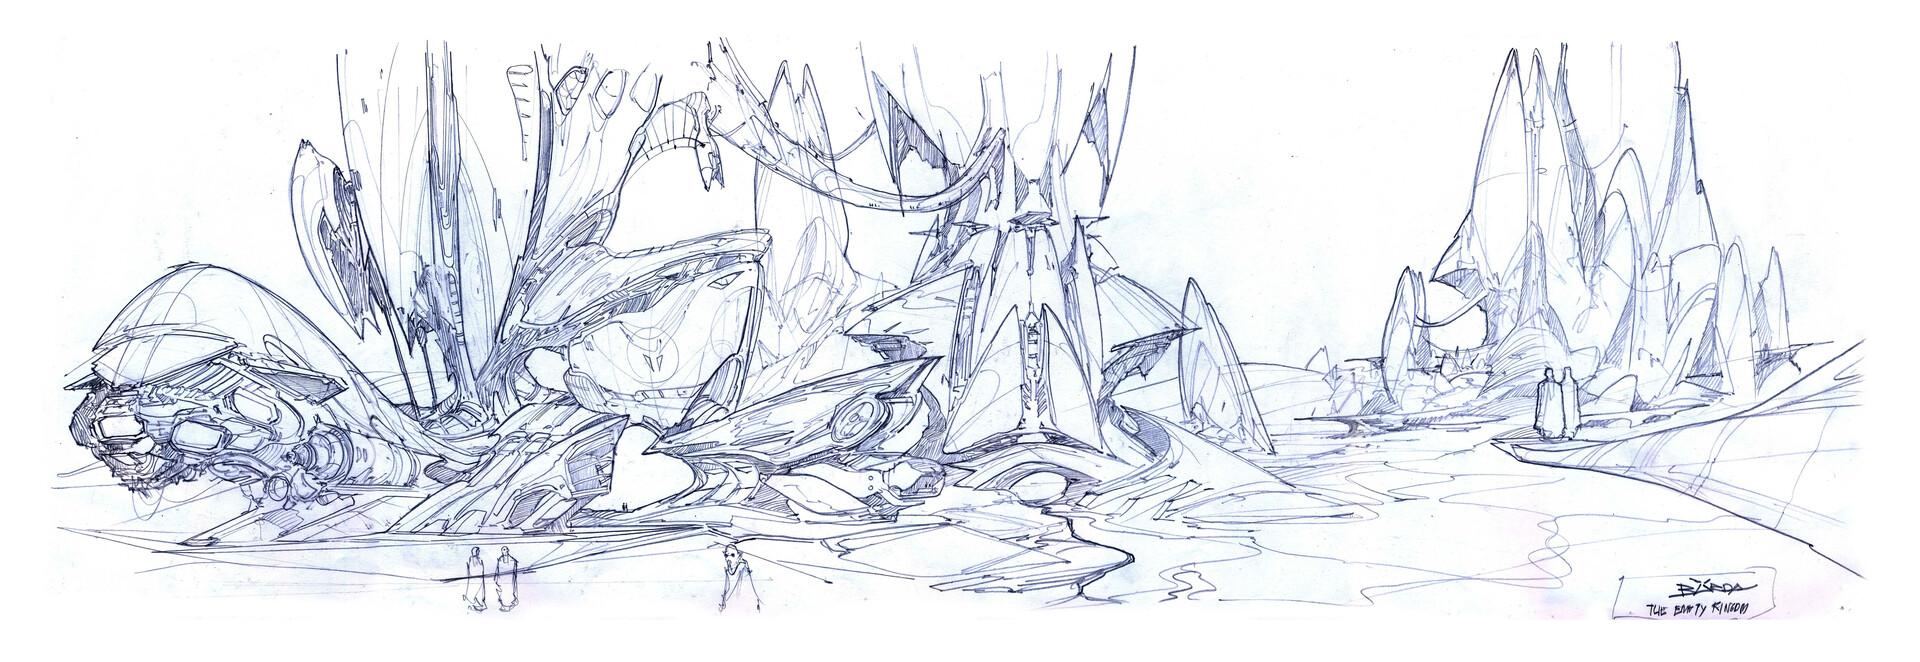 Alejandro burdisio bocetos the empty kingdom arcadia1